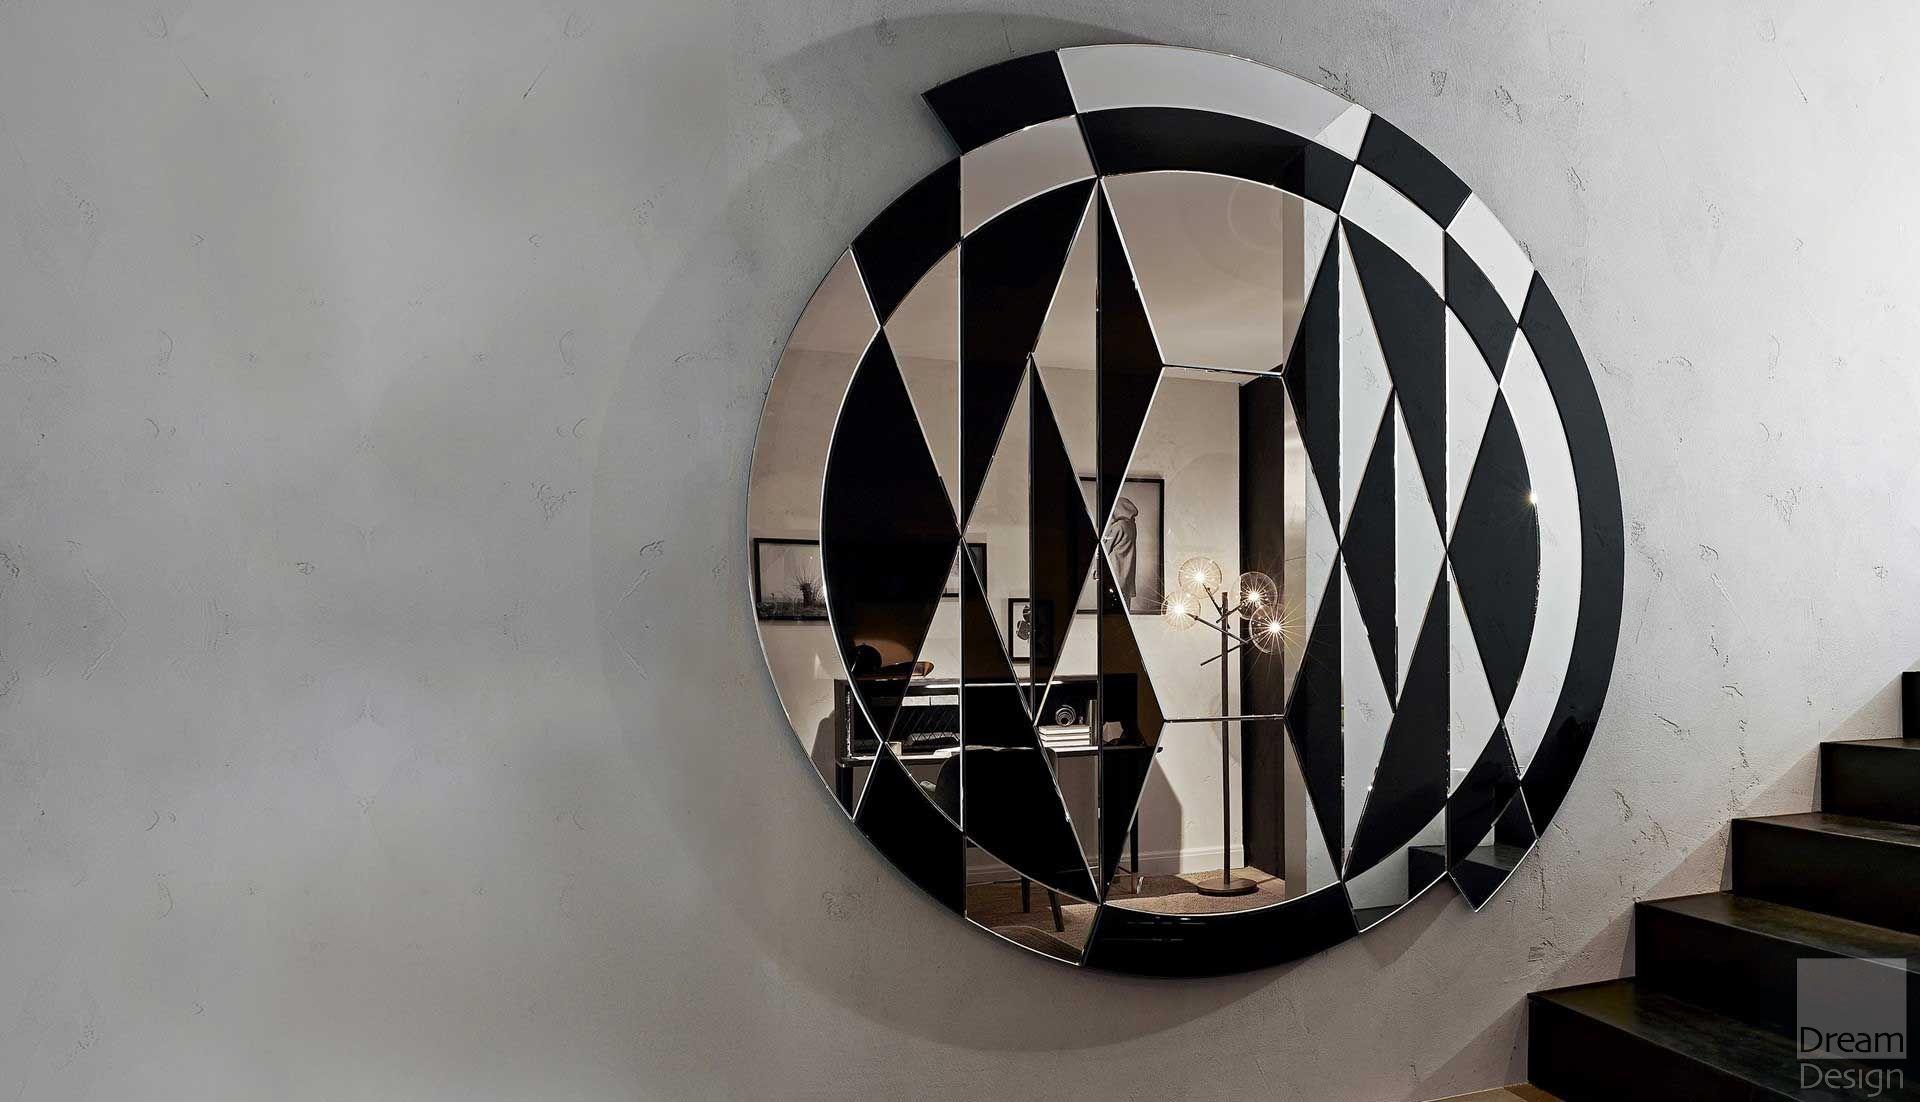 gallotti radice black white beat mirror everything but ordinary. Black Bedroom Furniture Sets. Home Design Ideas